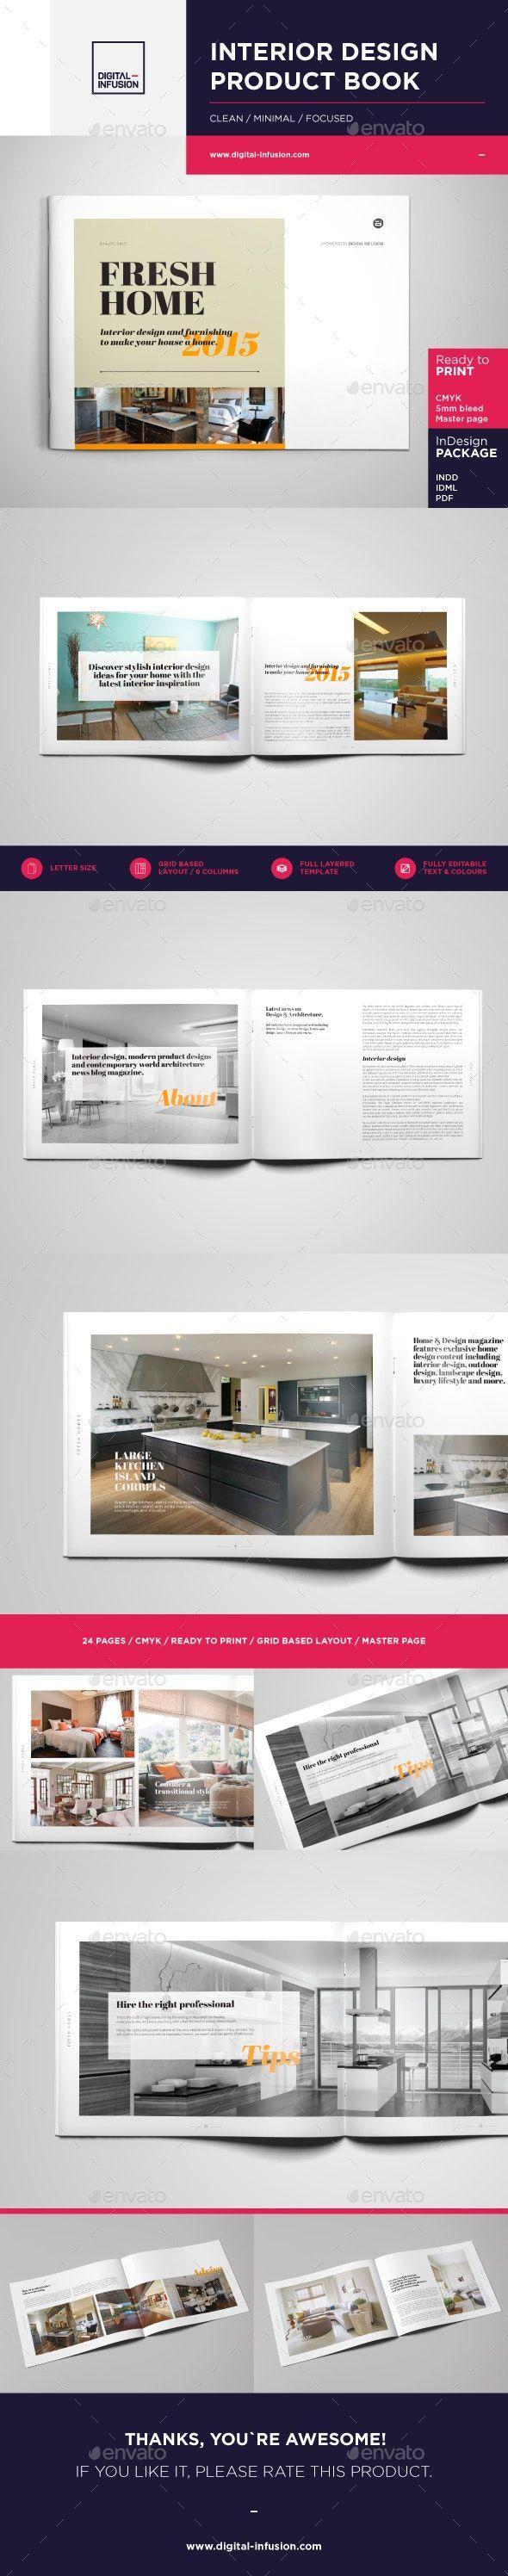 Interior Design Brochure Catalog Brochure Design Catalog Design Brochure Design Template